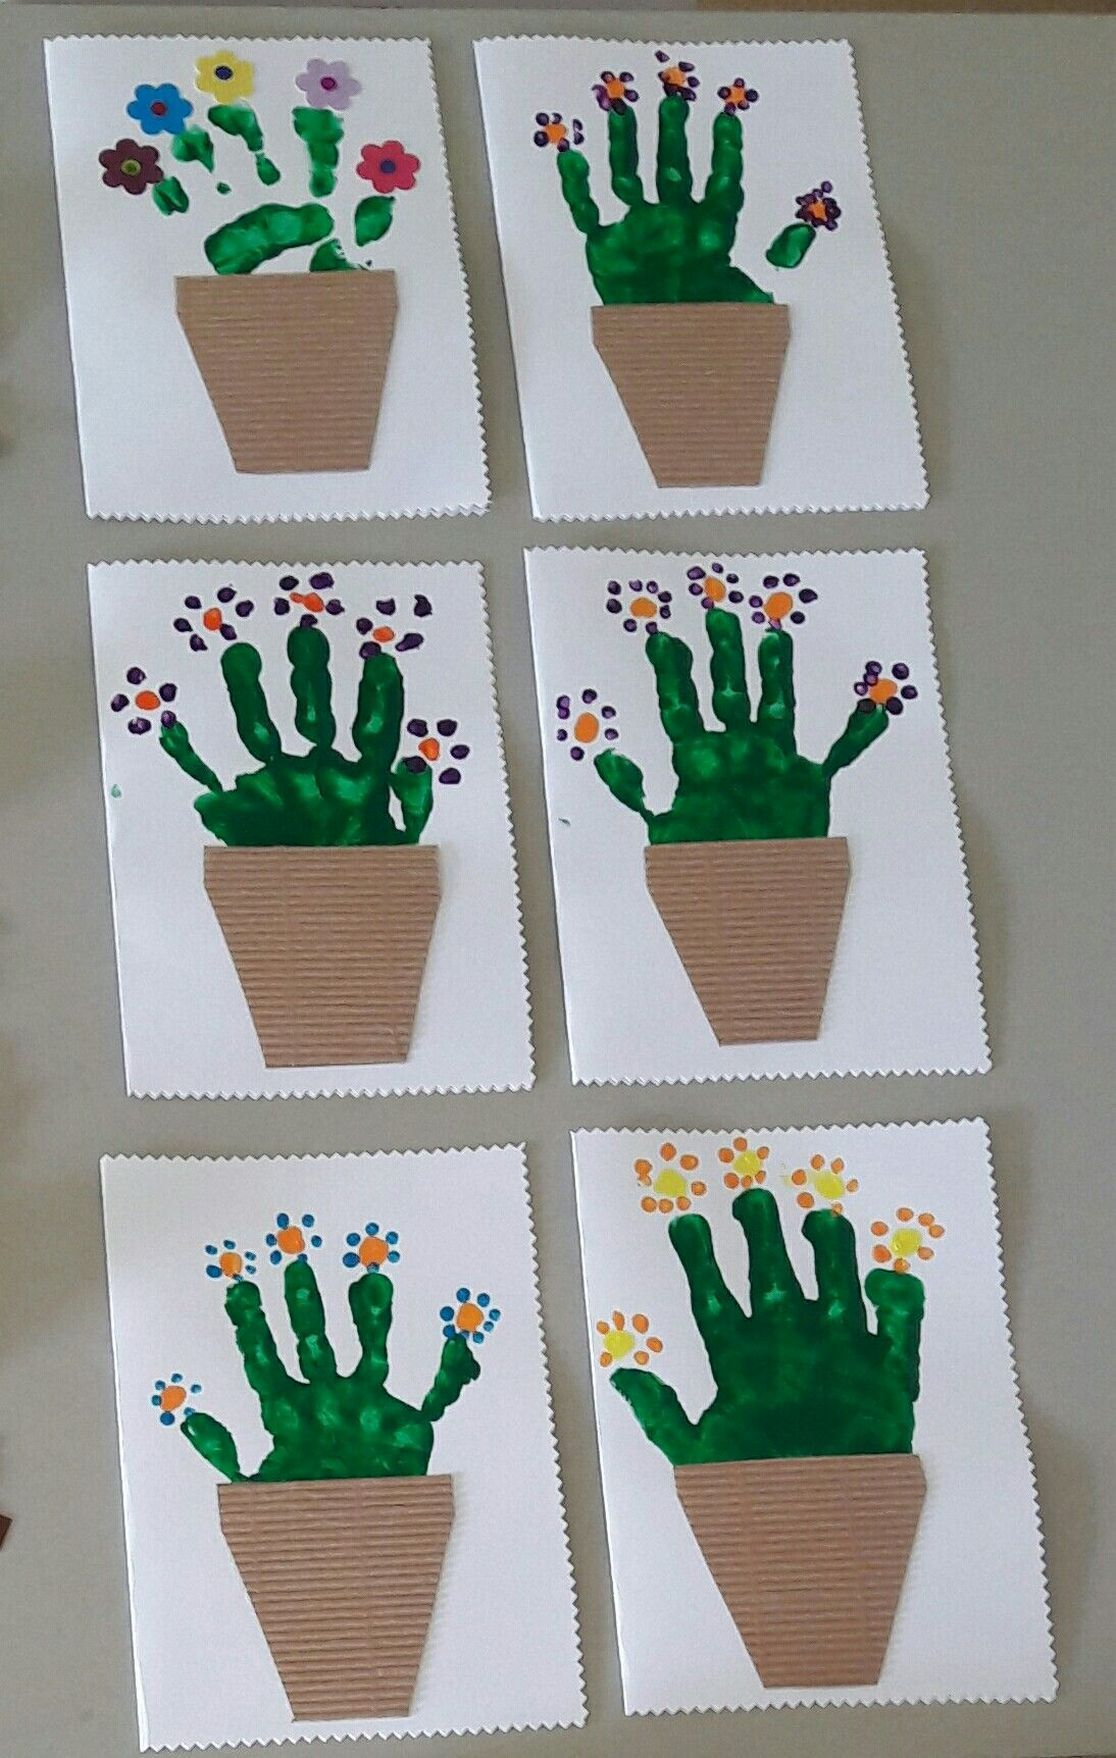 Spring crafts preschool creative art ideas 42 - Creative Maxx Ideas